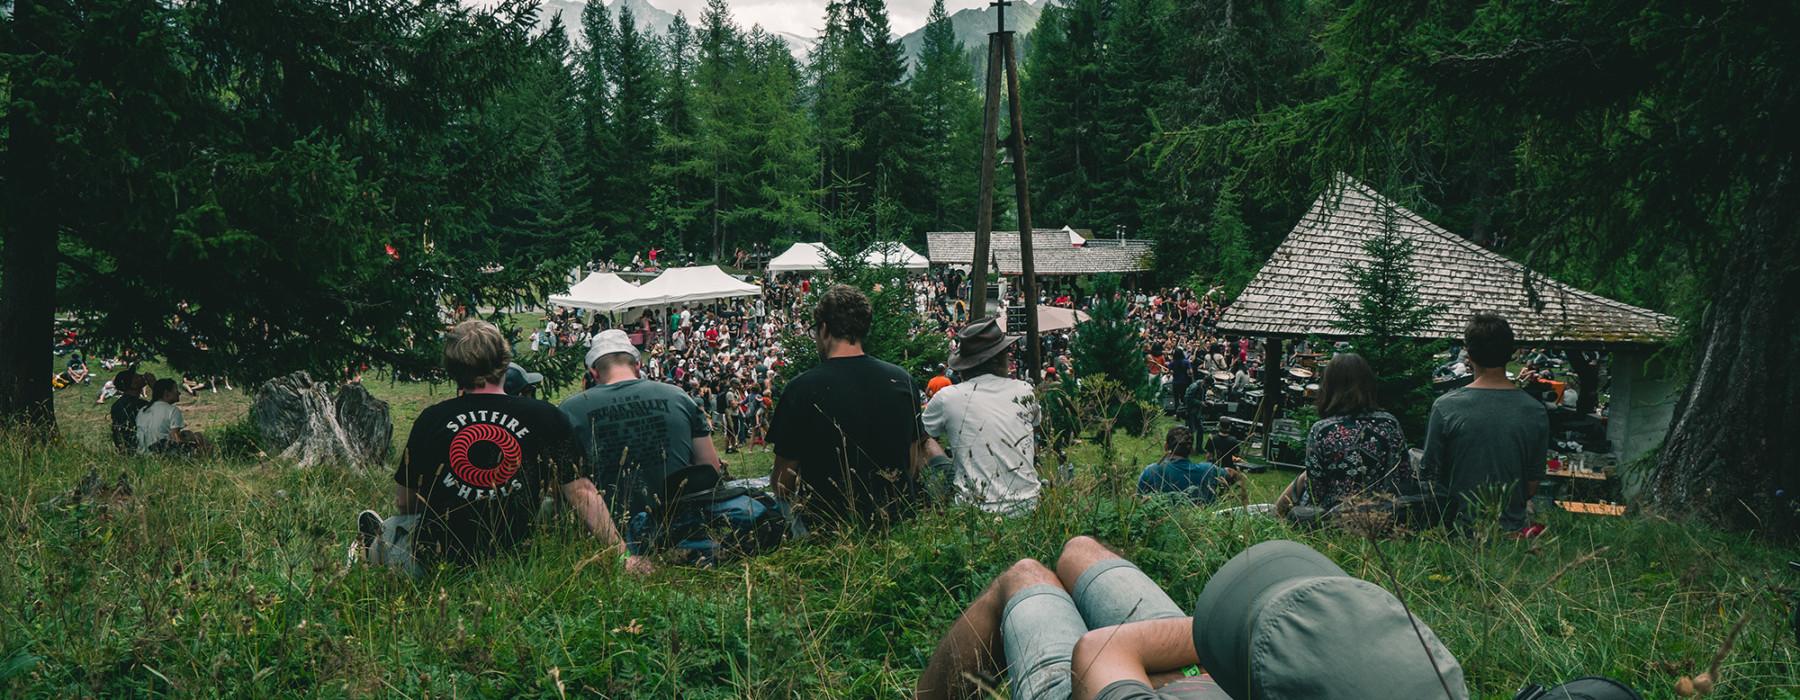 Palp Festival 2019 Report